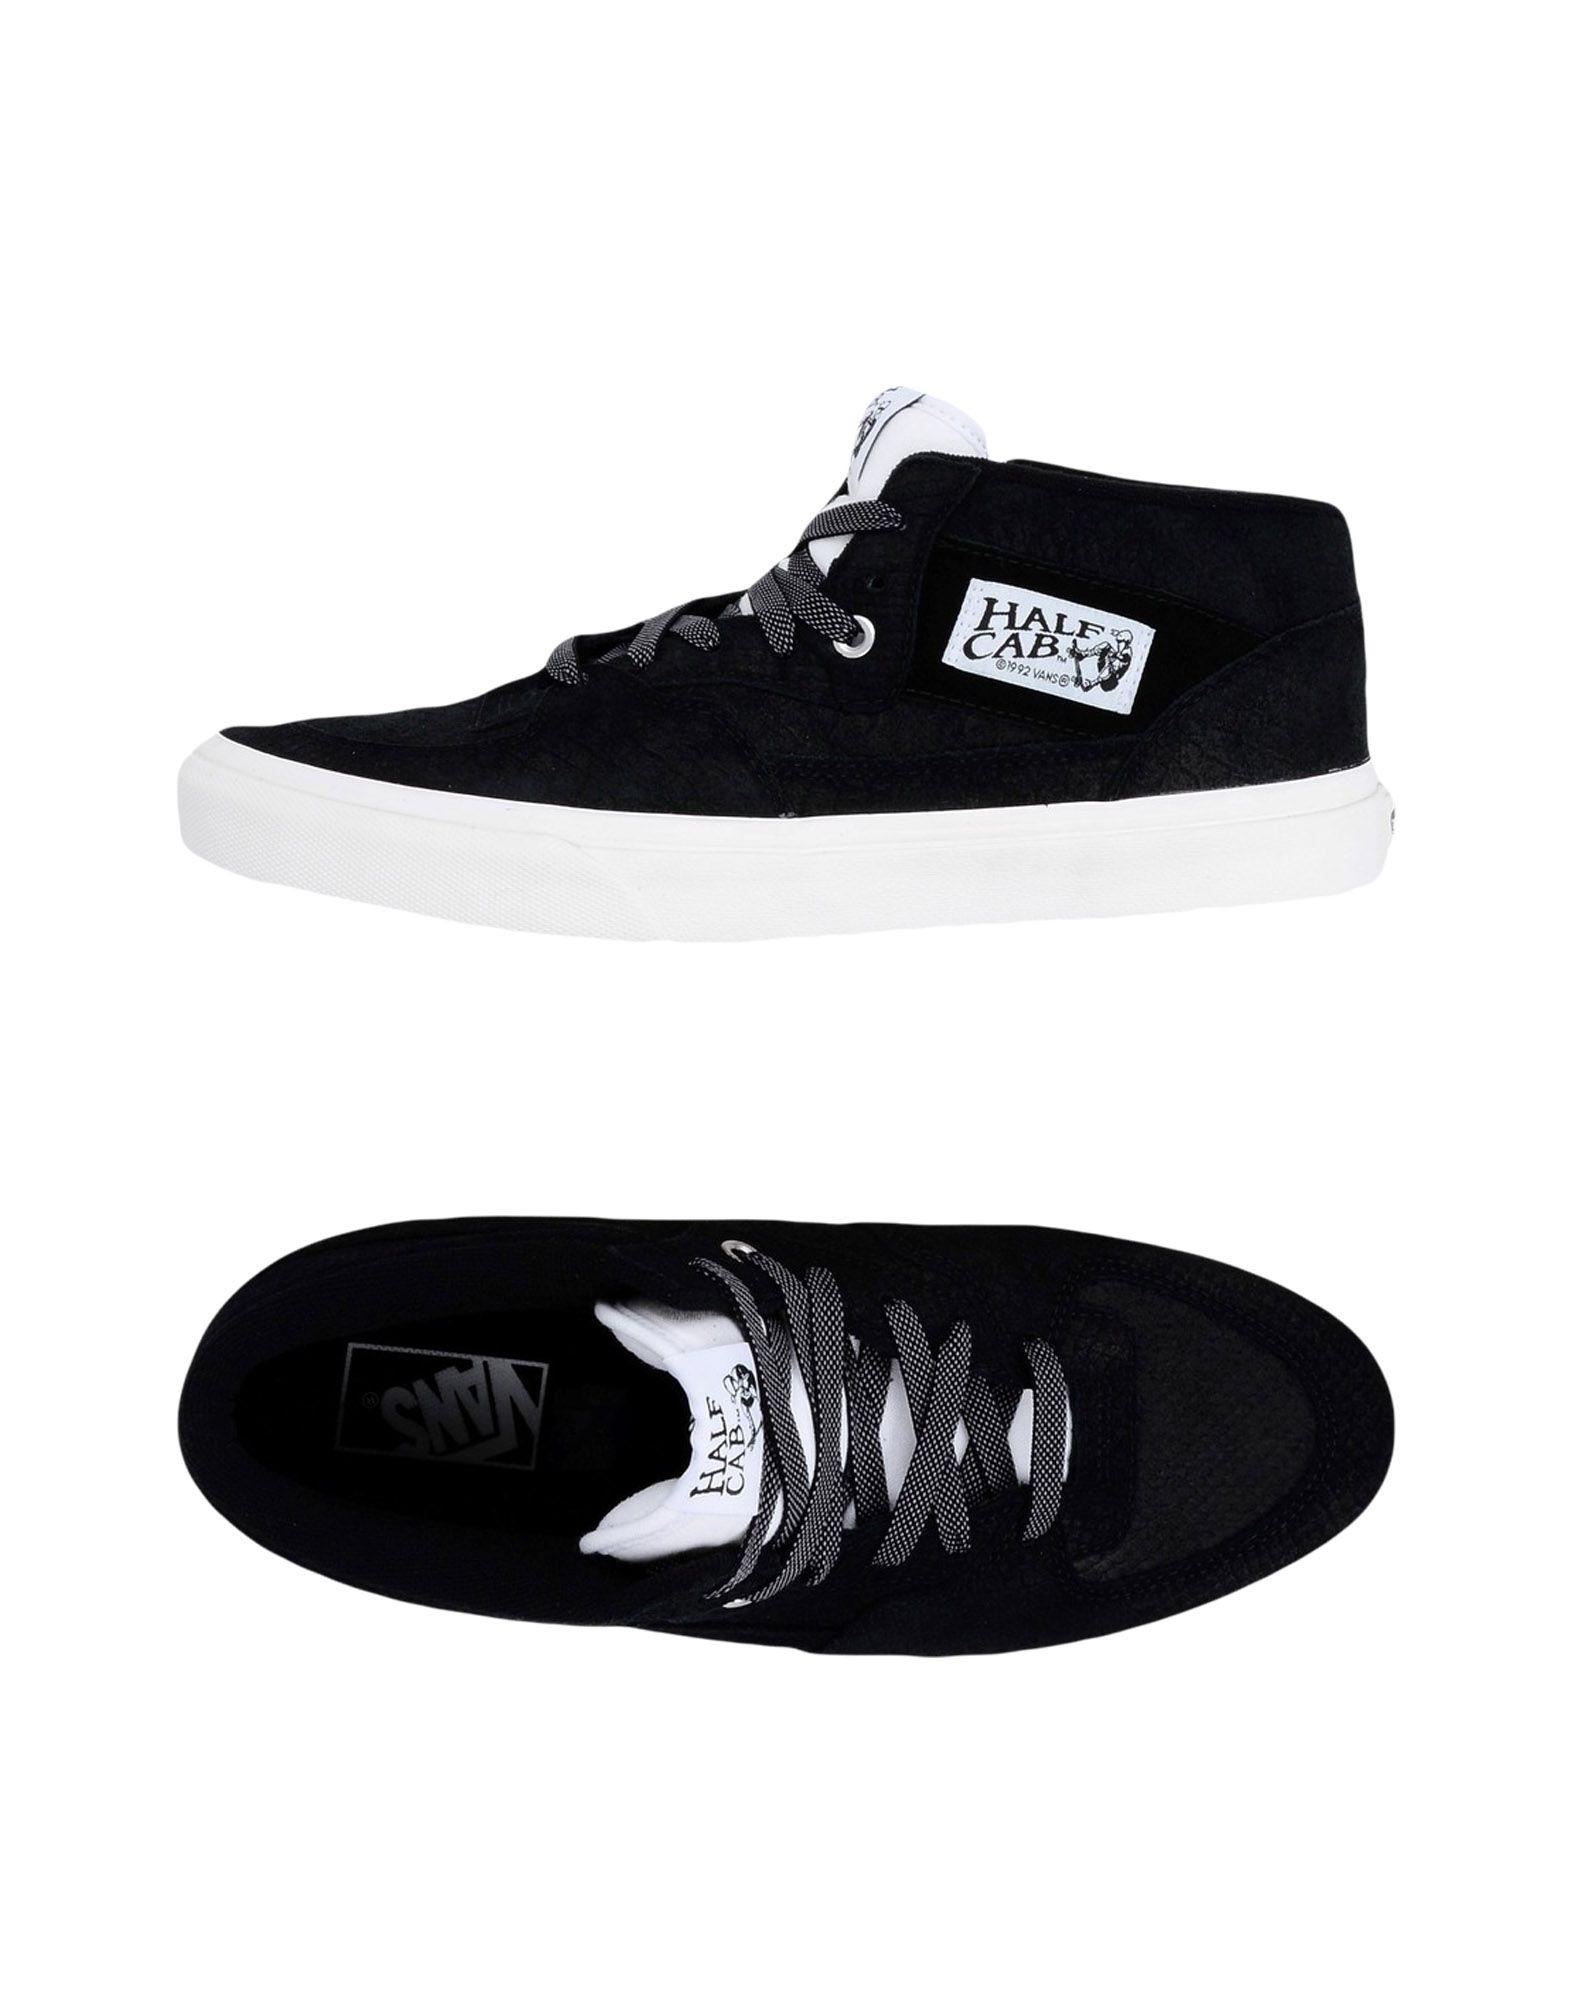 Sneakers Vans Ua Half Cab - Uomo - 11327445HL